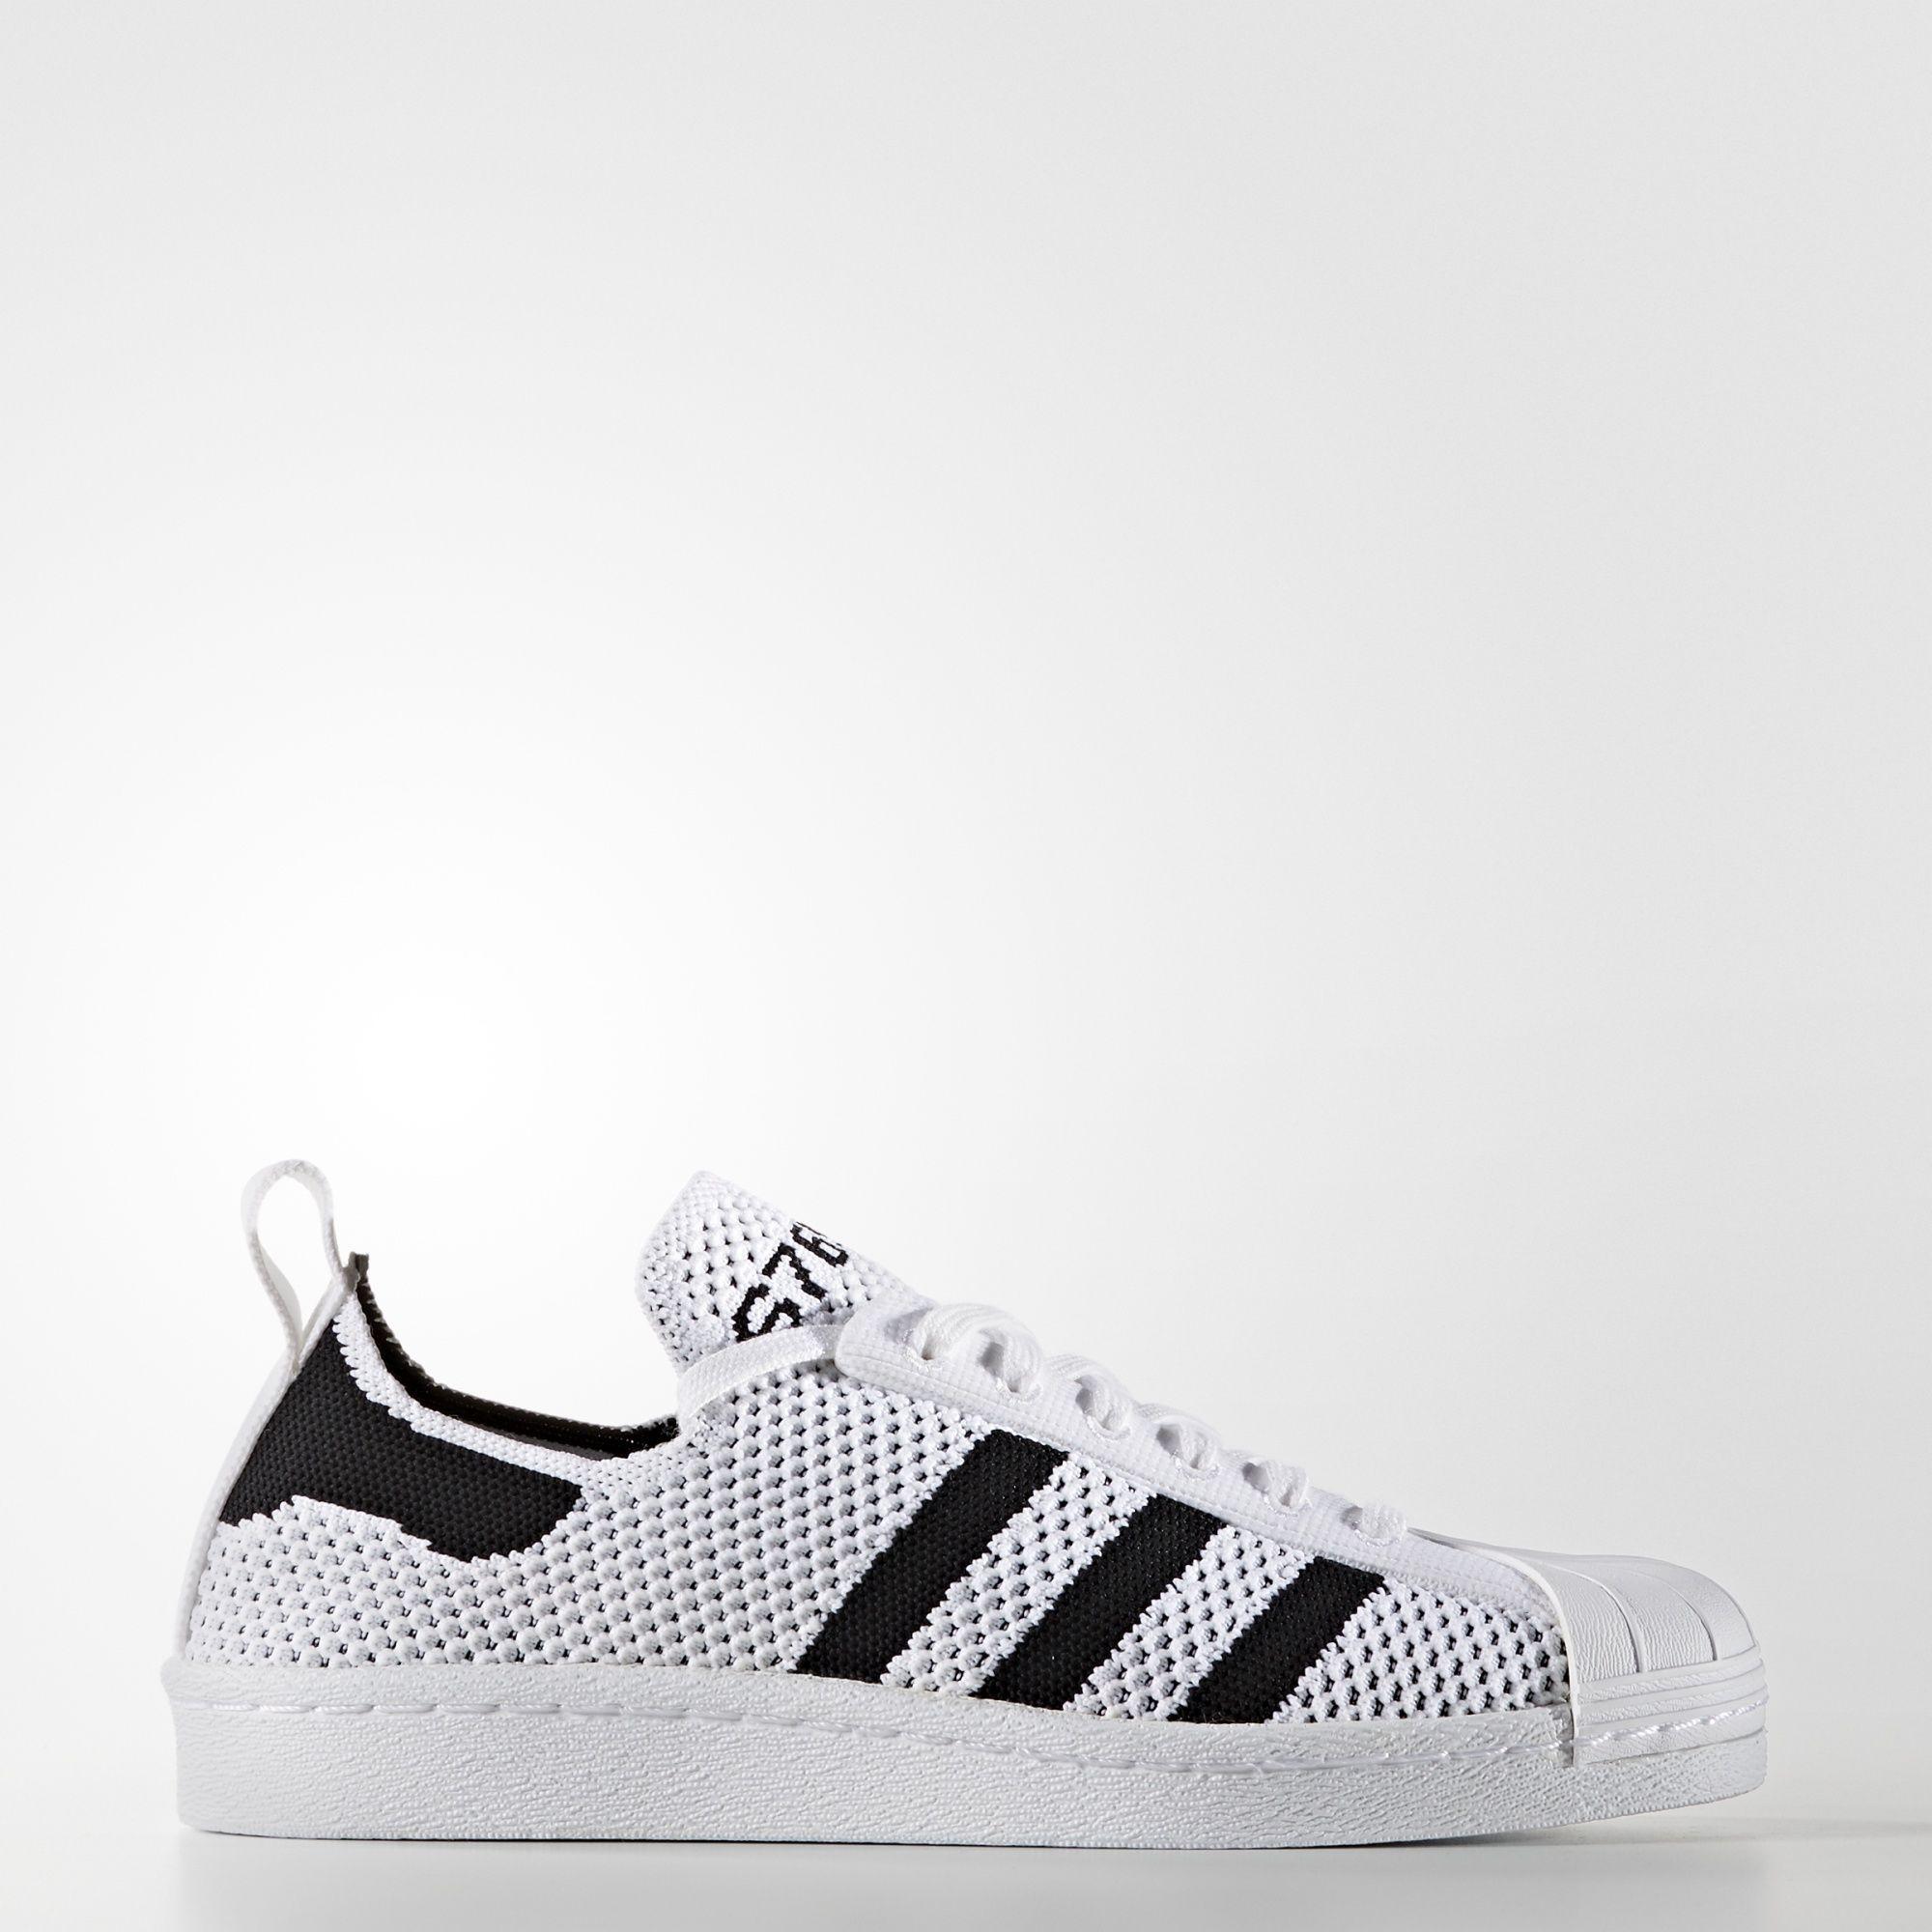 adidas Superstar 80s Primeknit Slip on Schoenen Adidas  Adidas